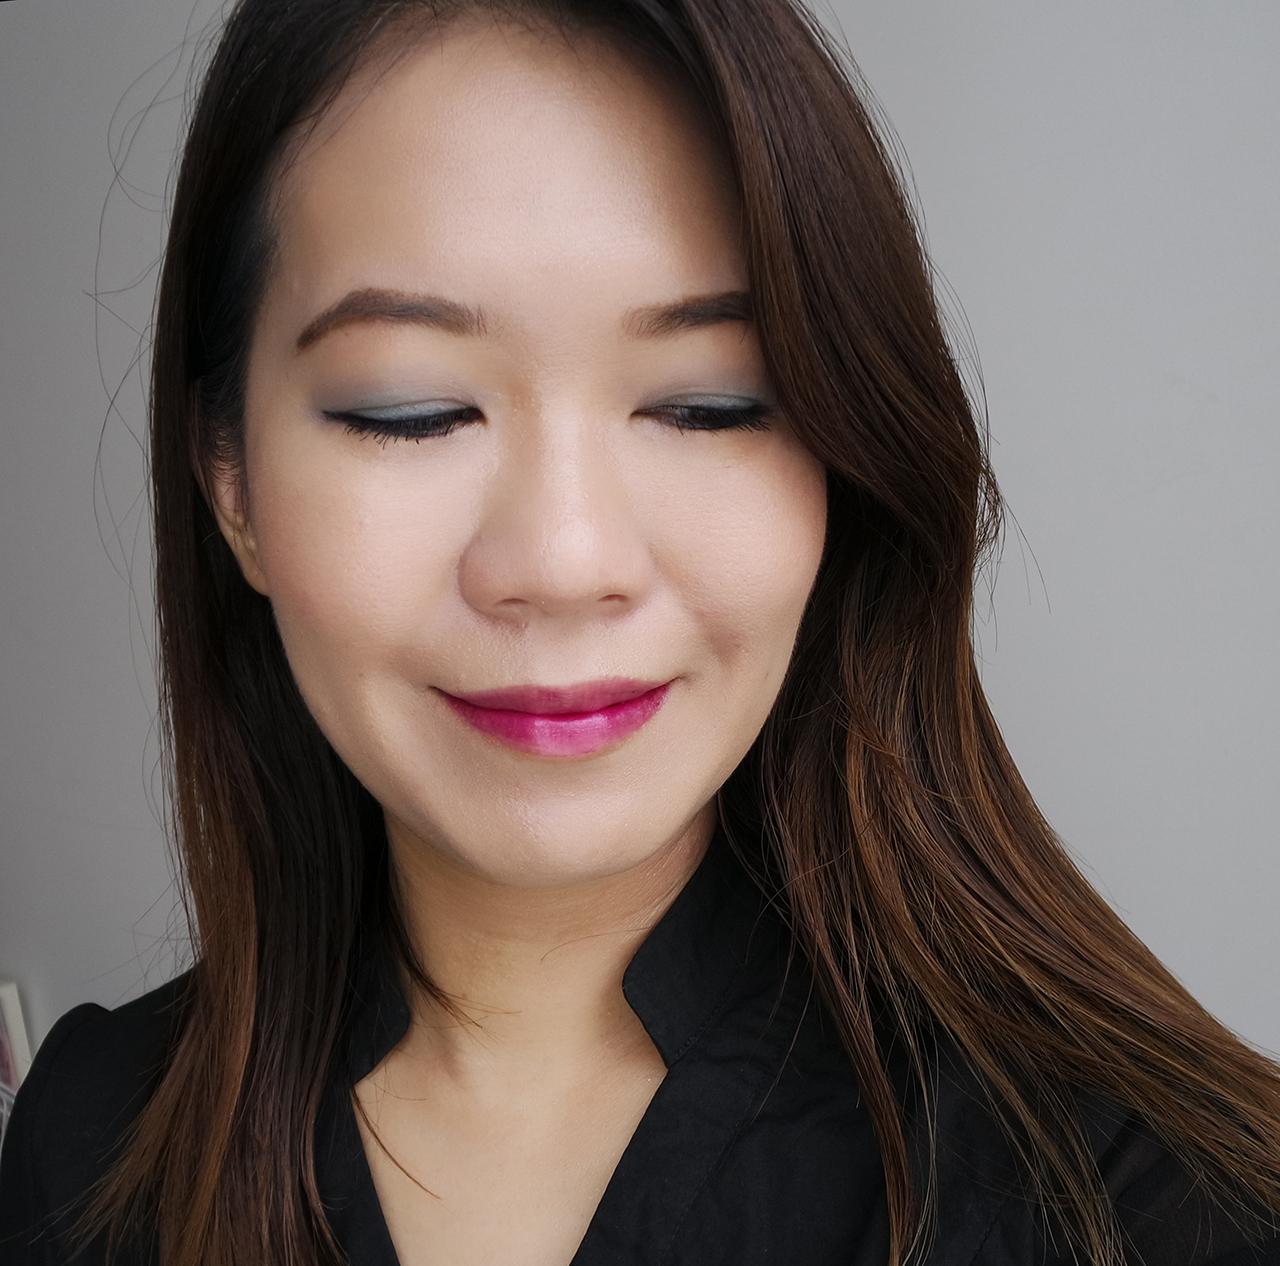 Shiseido Paperlight Cream Eye Color makeup look